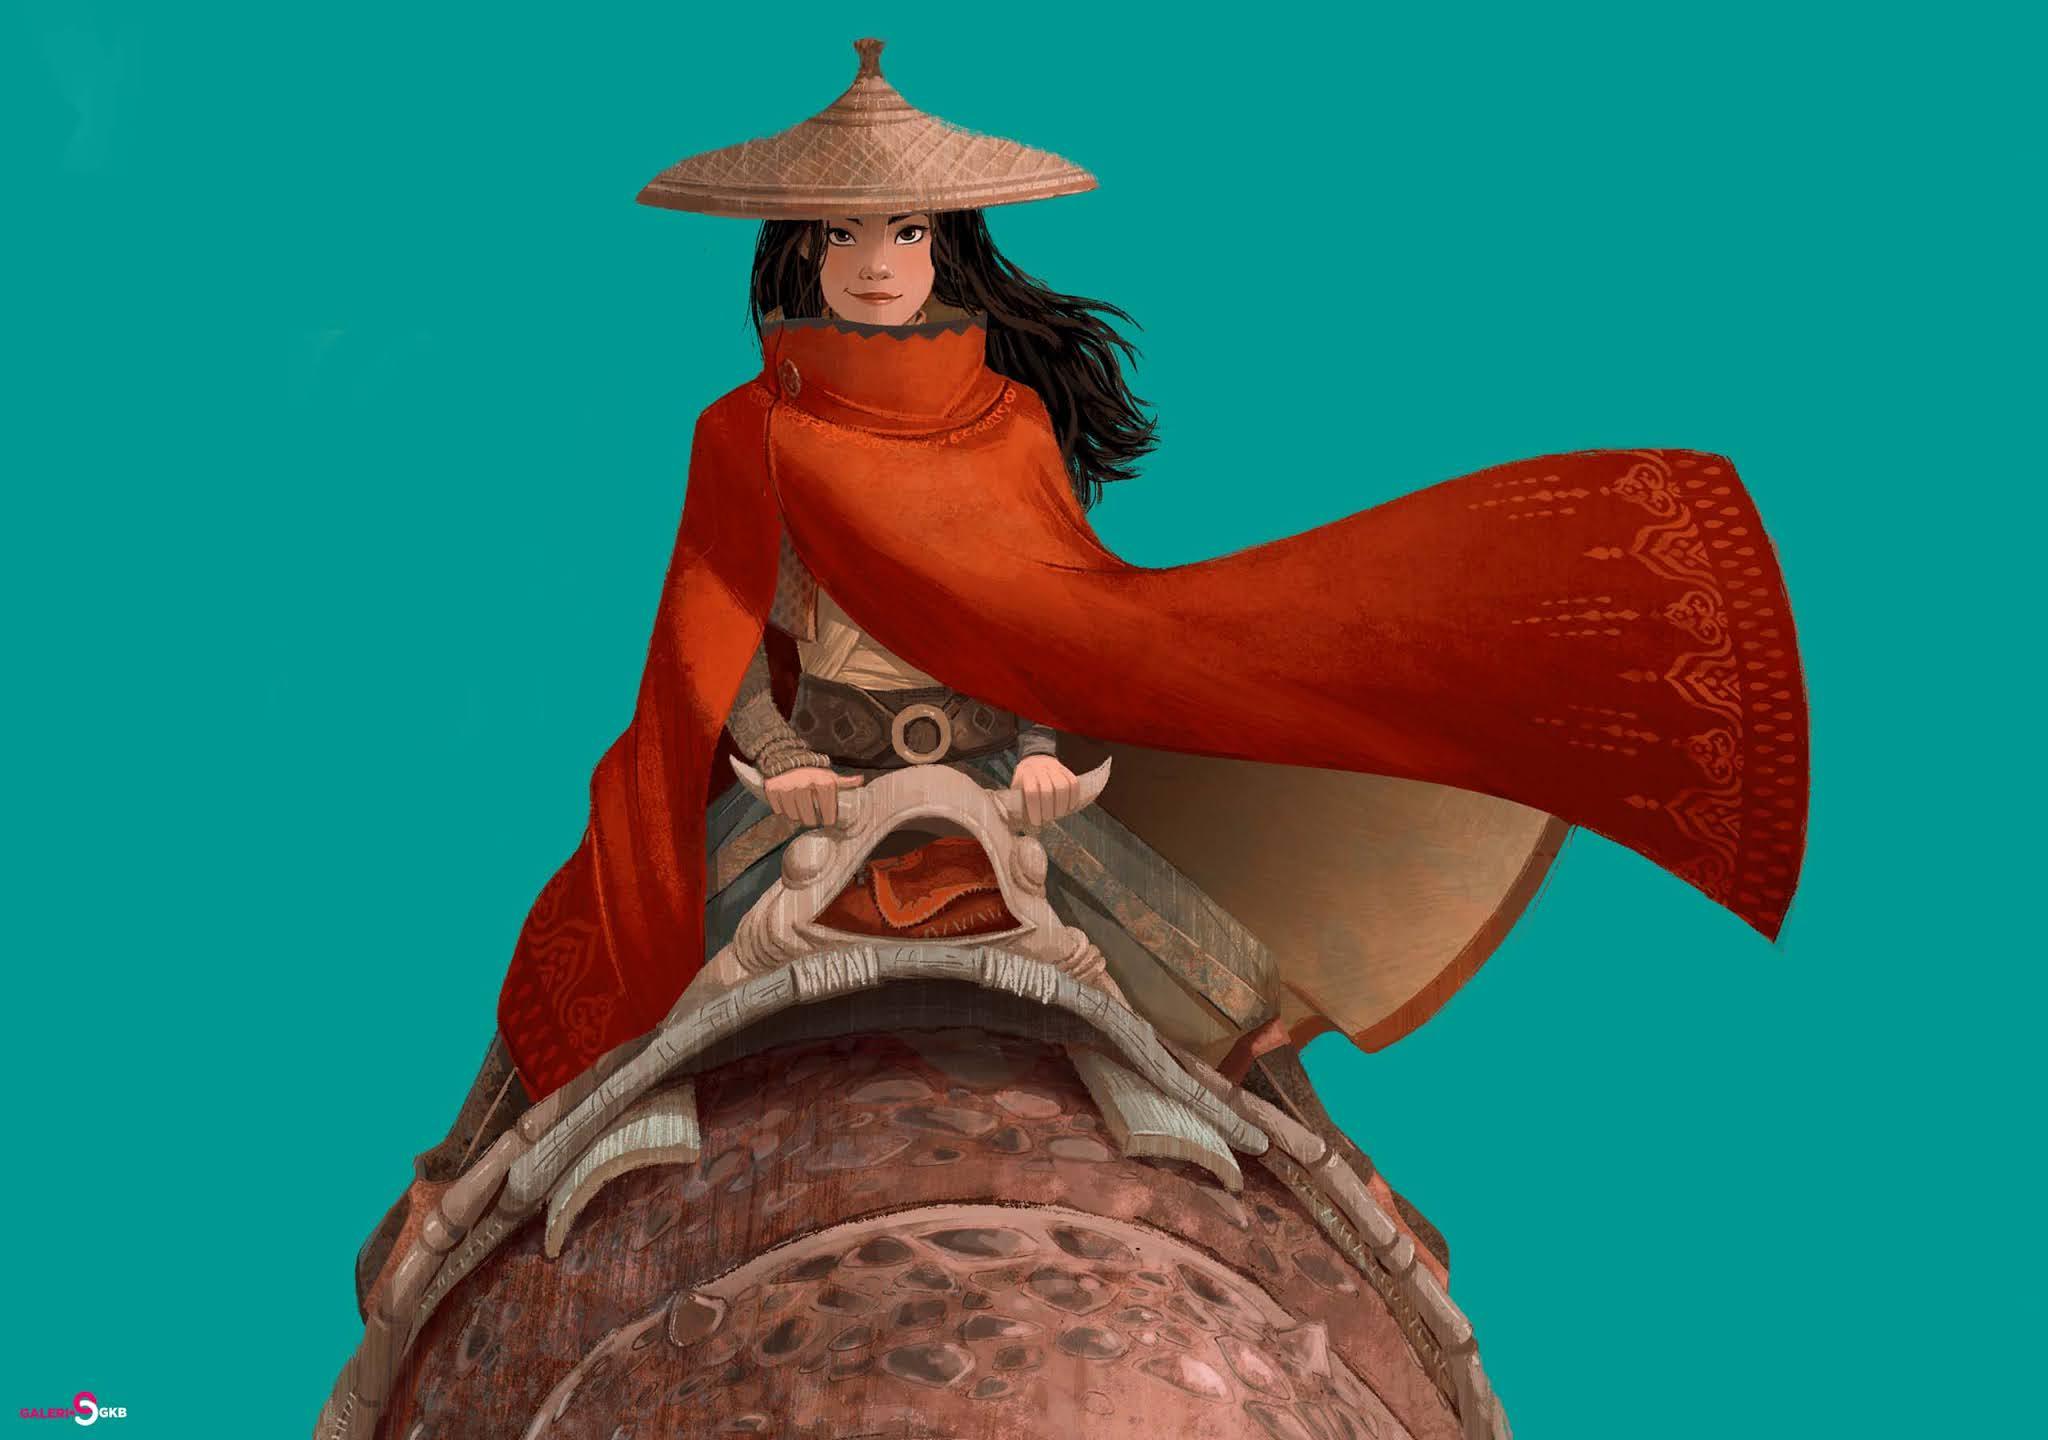 17 Amazing Raya And The Last Dragon Ultra HD Wallpaper For PC Desktop